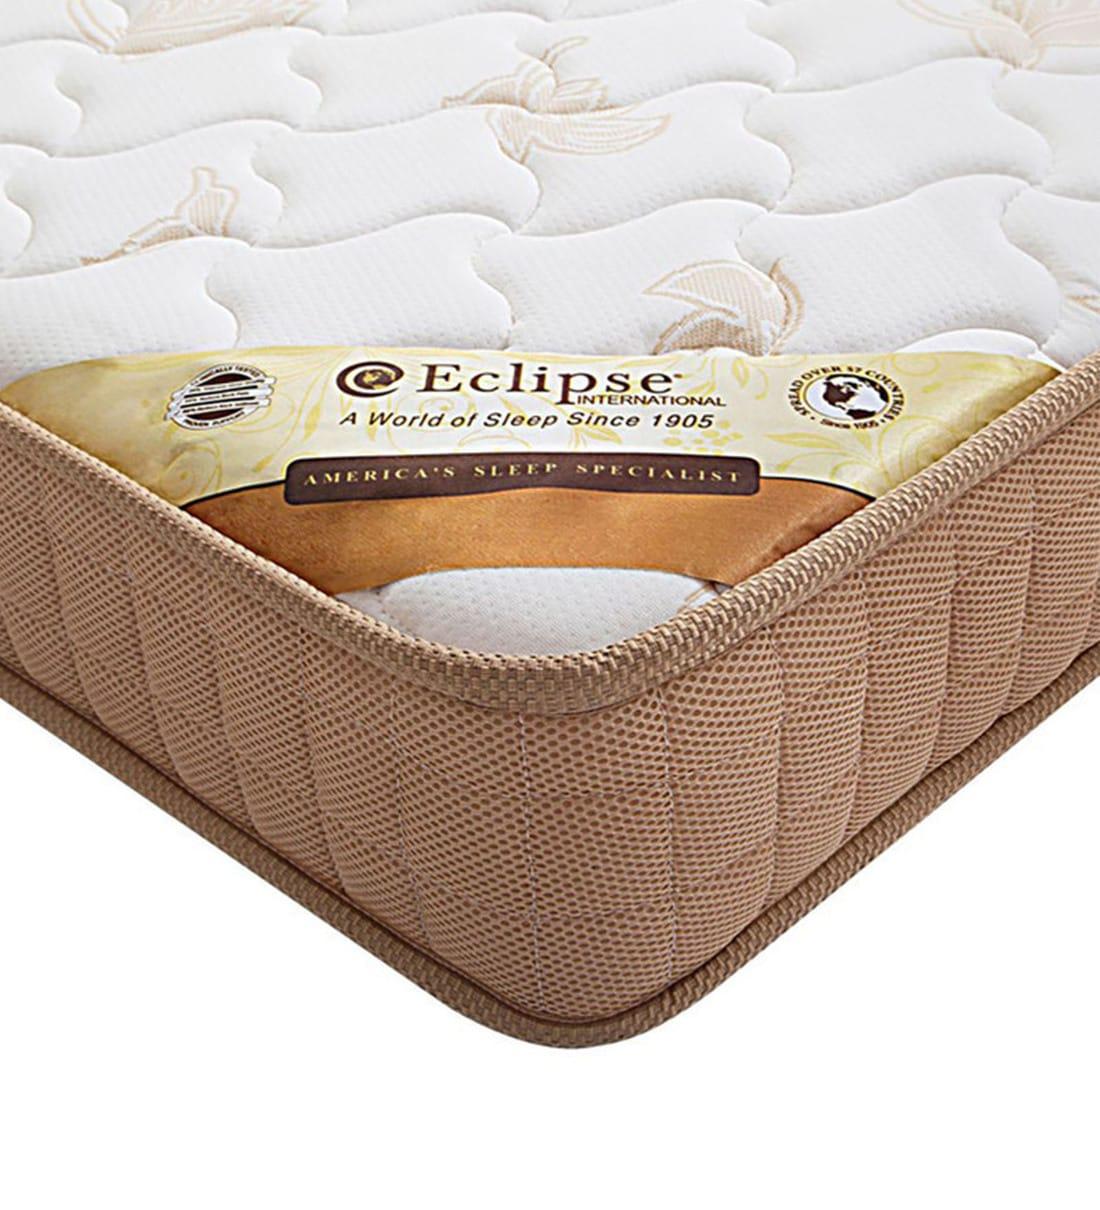 Buy Bonnell Spring 34x21x6 Baby Crib Mattress By Eclipse International Online Crib Mattress Baby Mattresses Mattresses Pepperfry Product